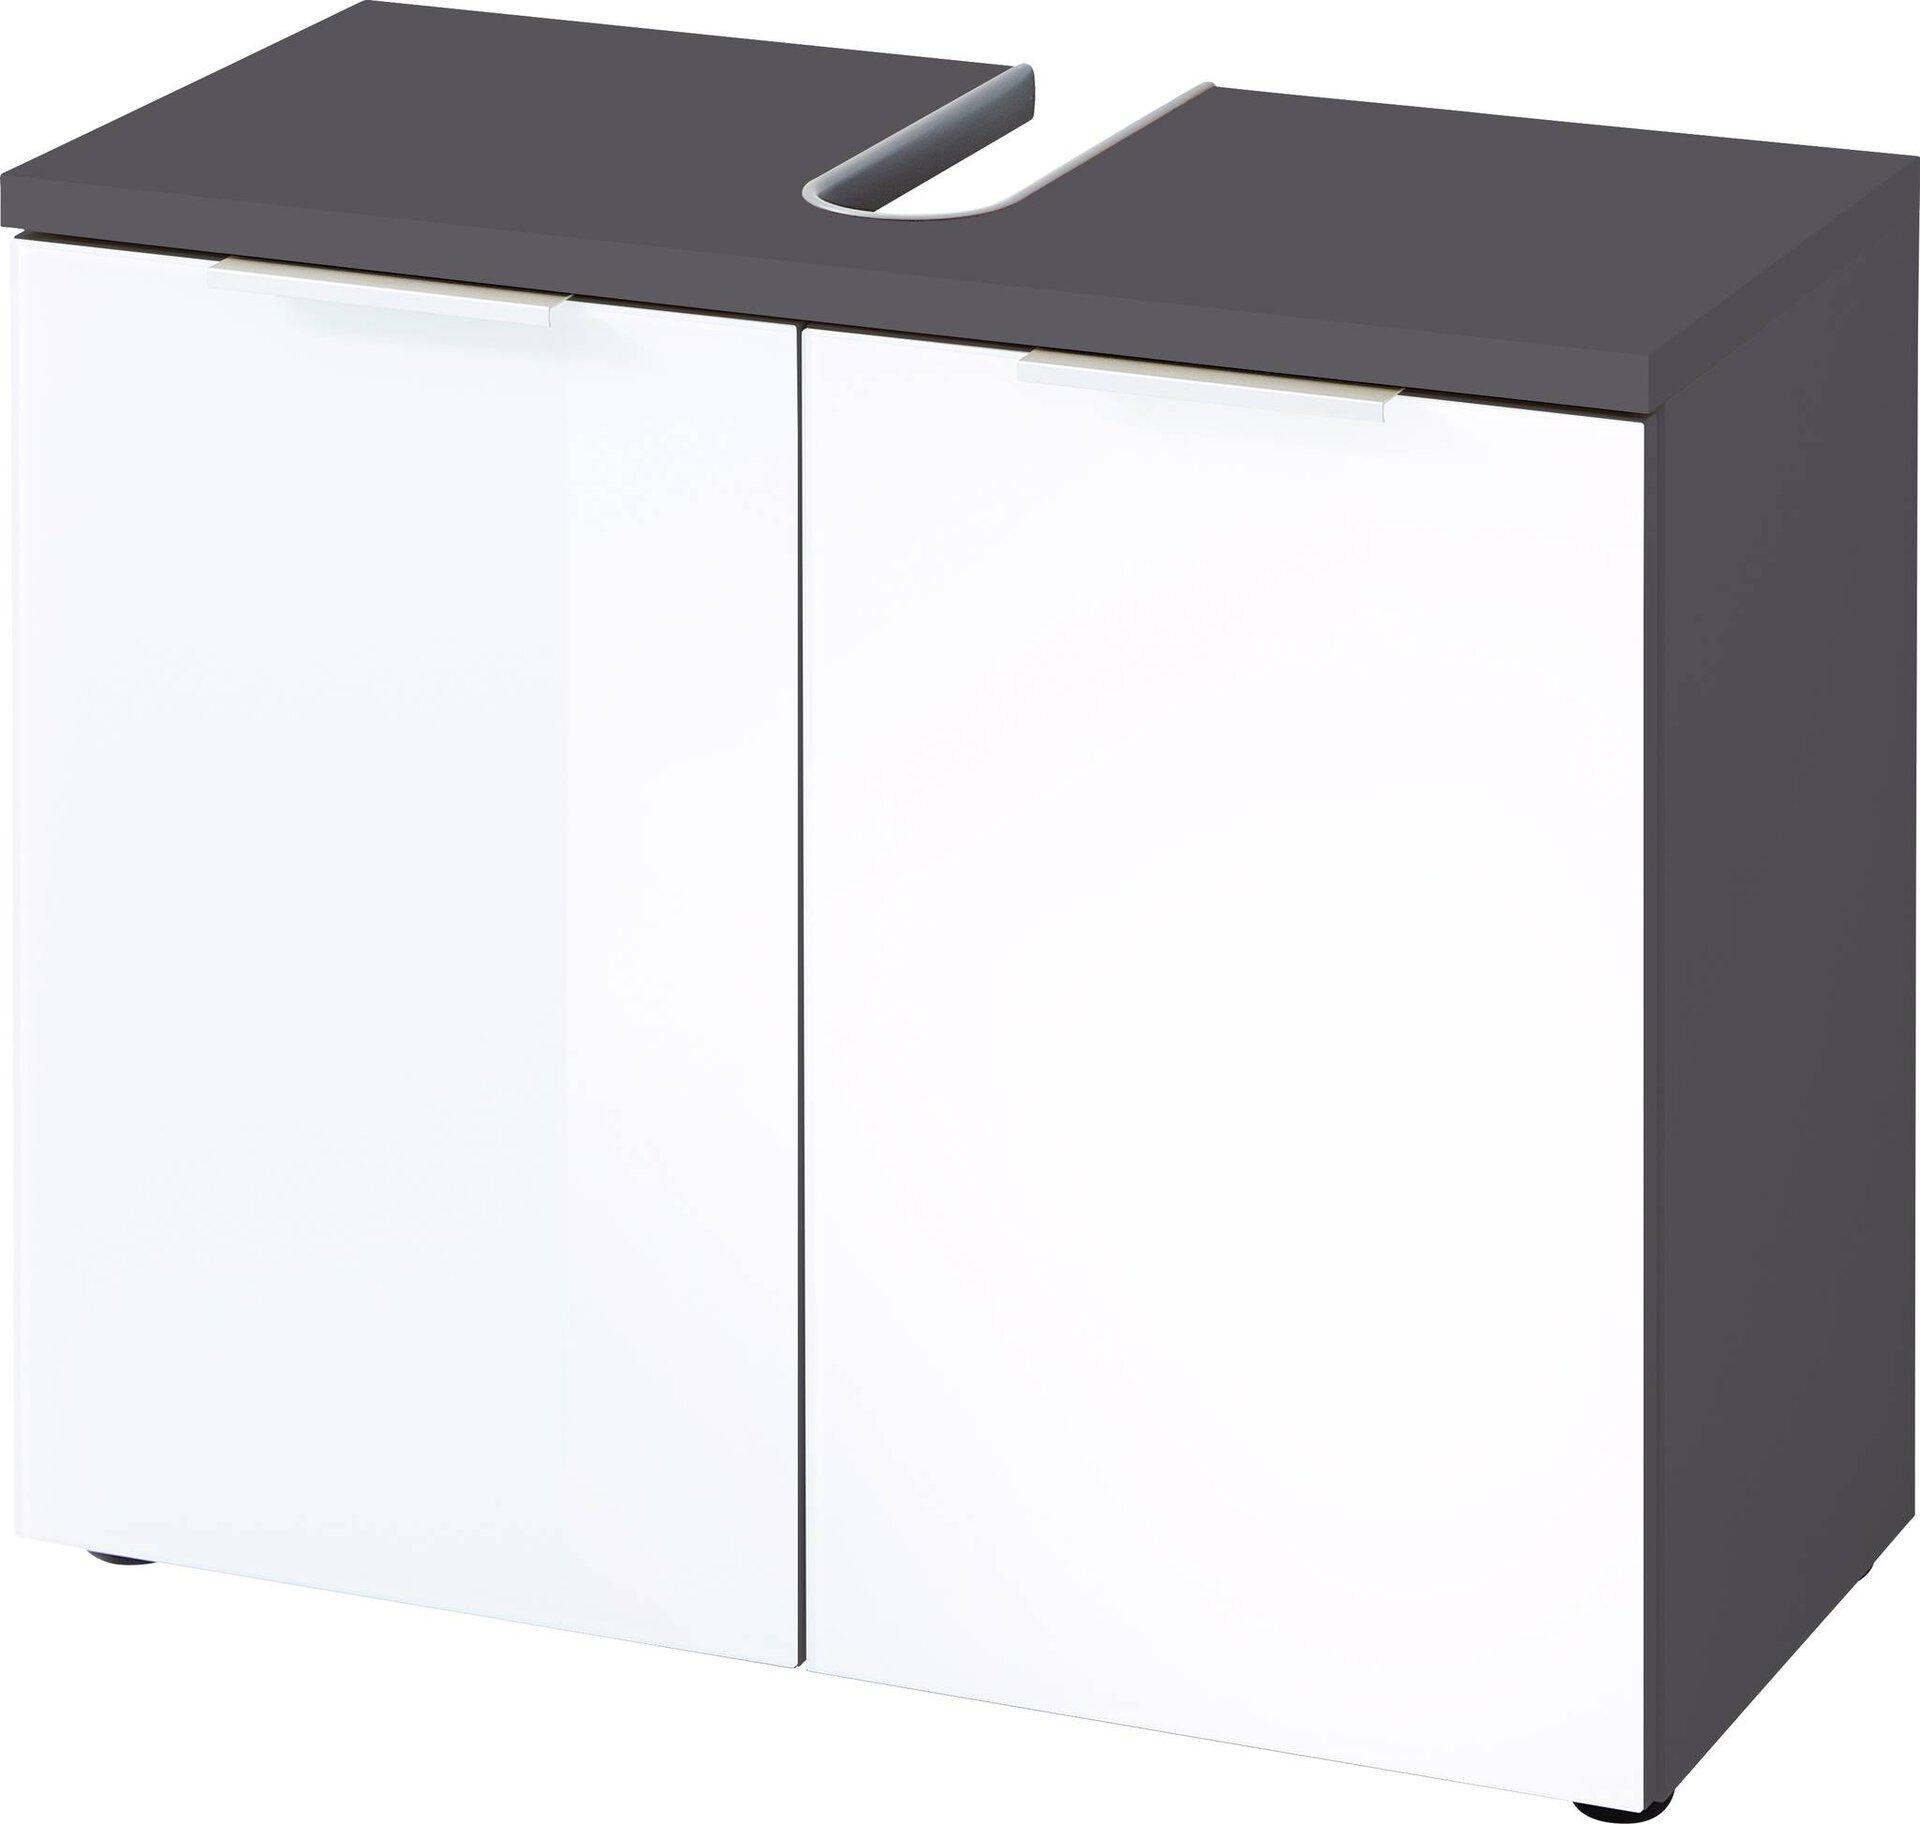 Waschbeckenunterschrank GW-PESCARA Germania Metall 34 x 58 x 70 cm